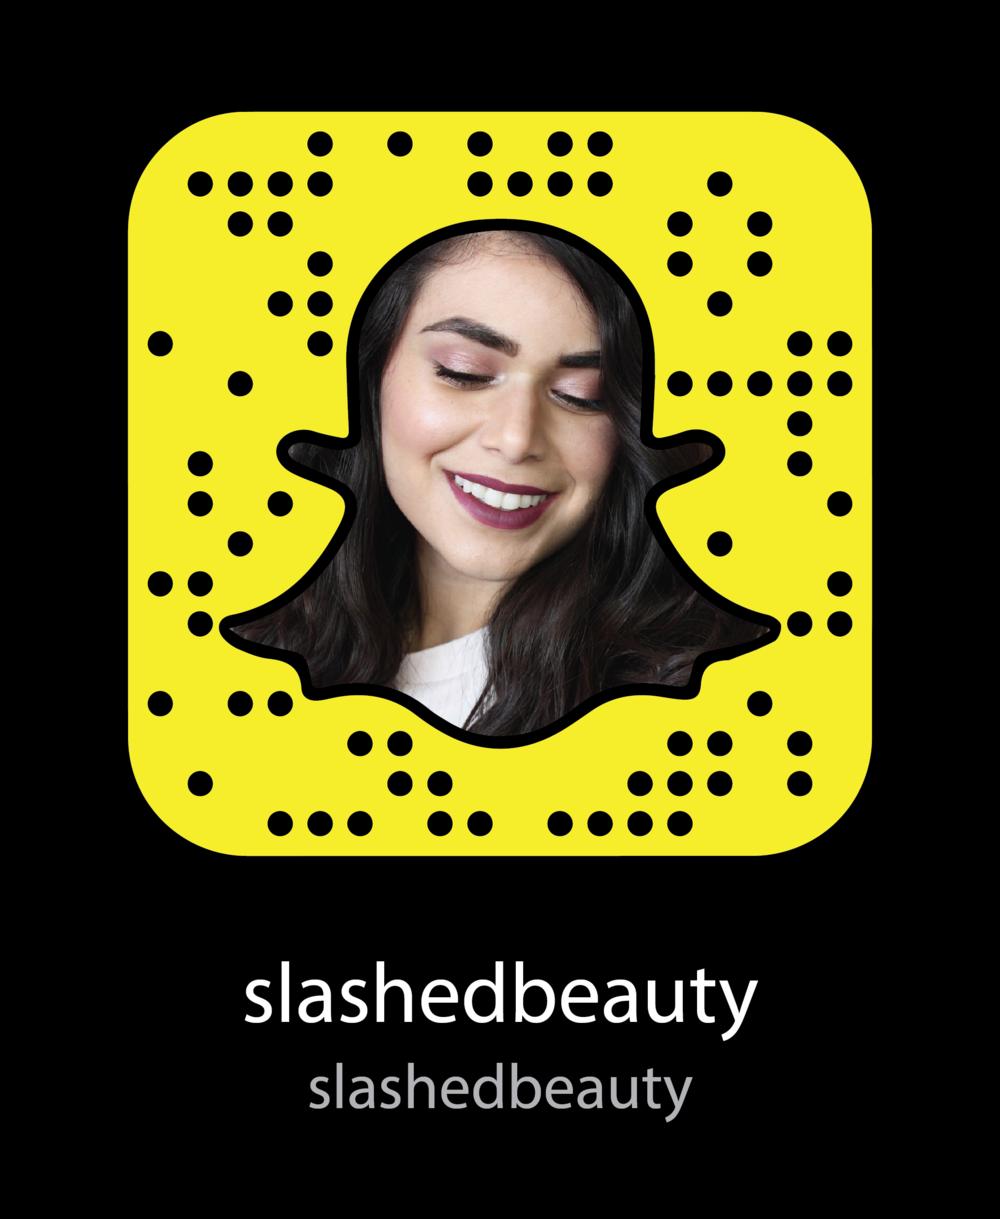 slashedbeauty-Beauty-Bloggers-snapchat-snapcode.png